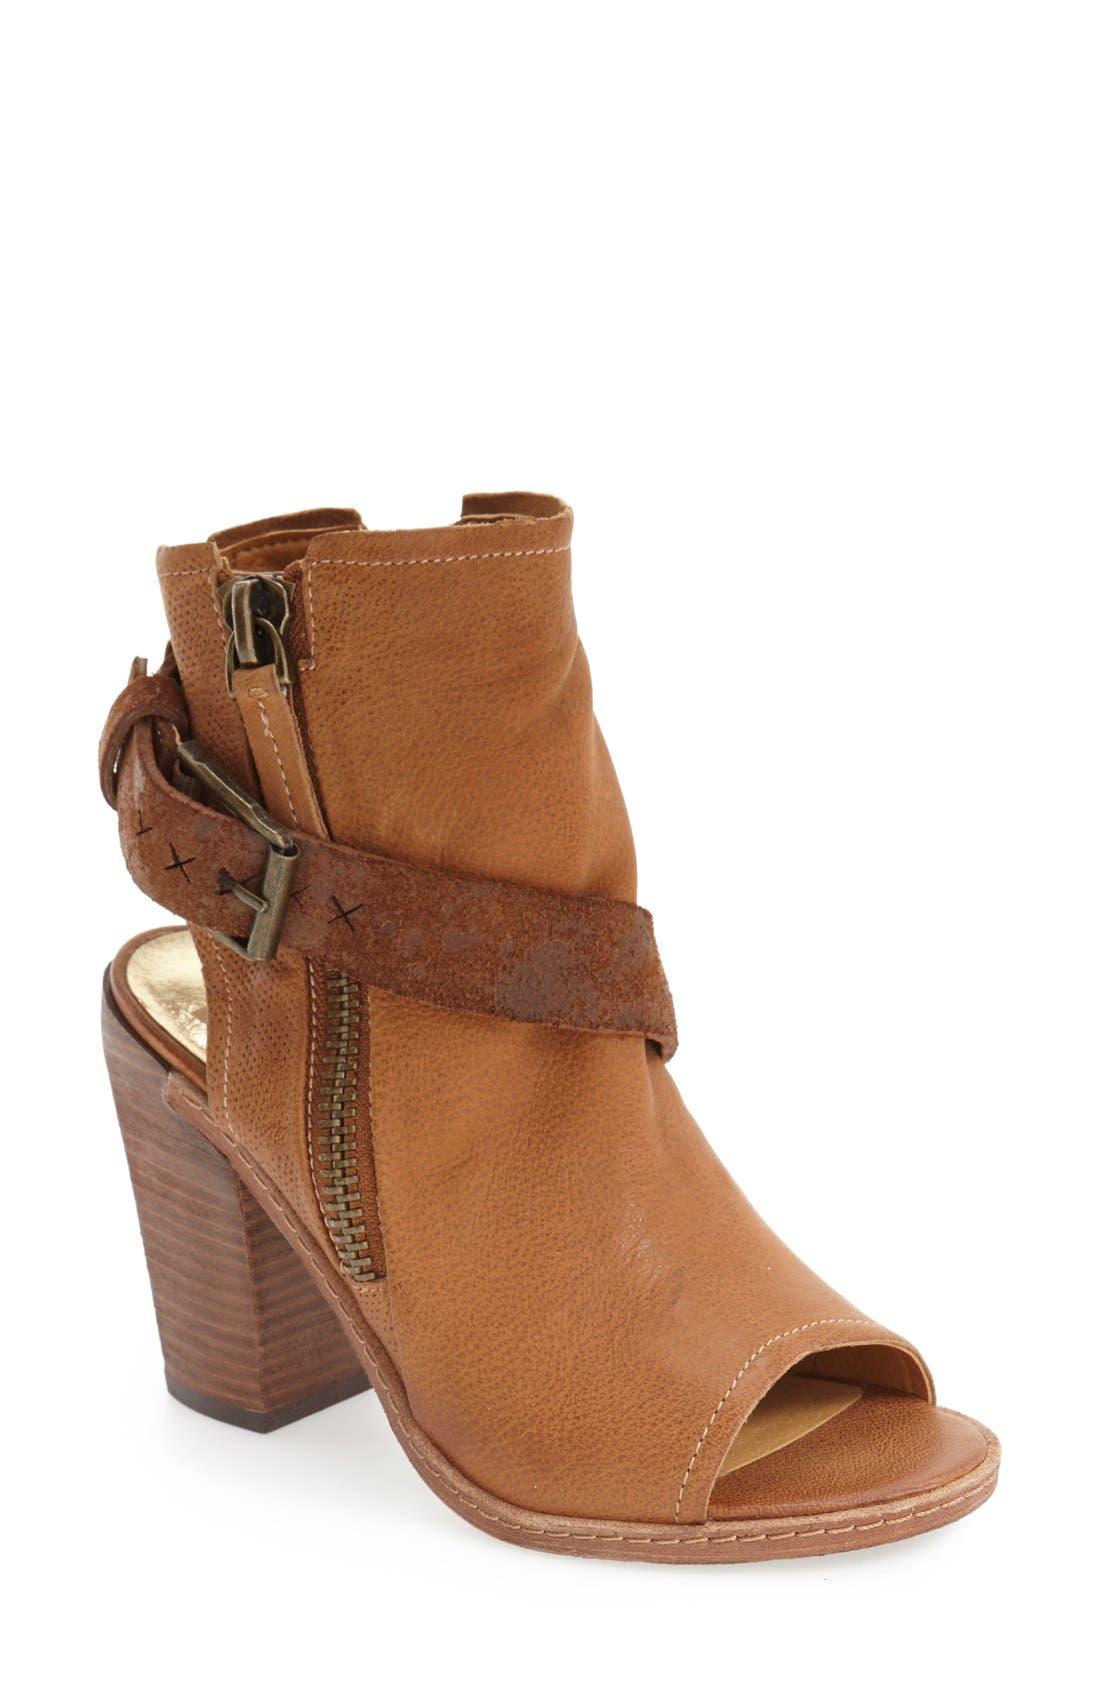 Main Image - Dolce Vita 'North' Buckle Sandal (Women)